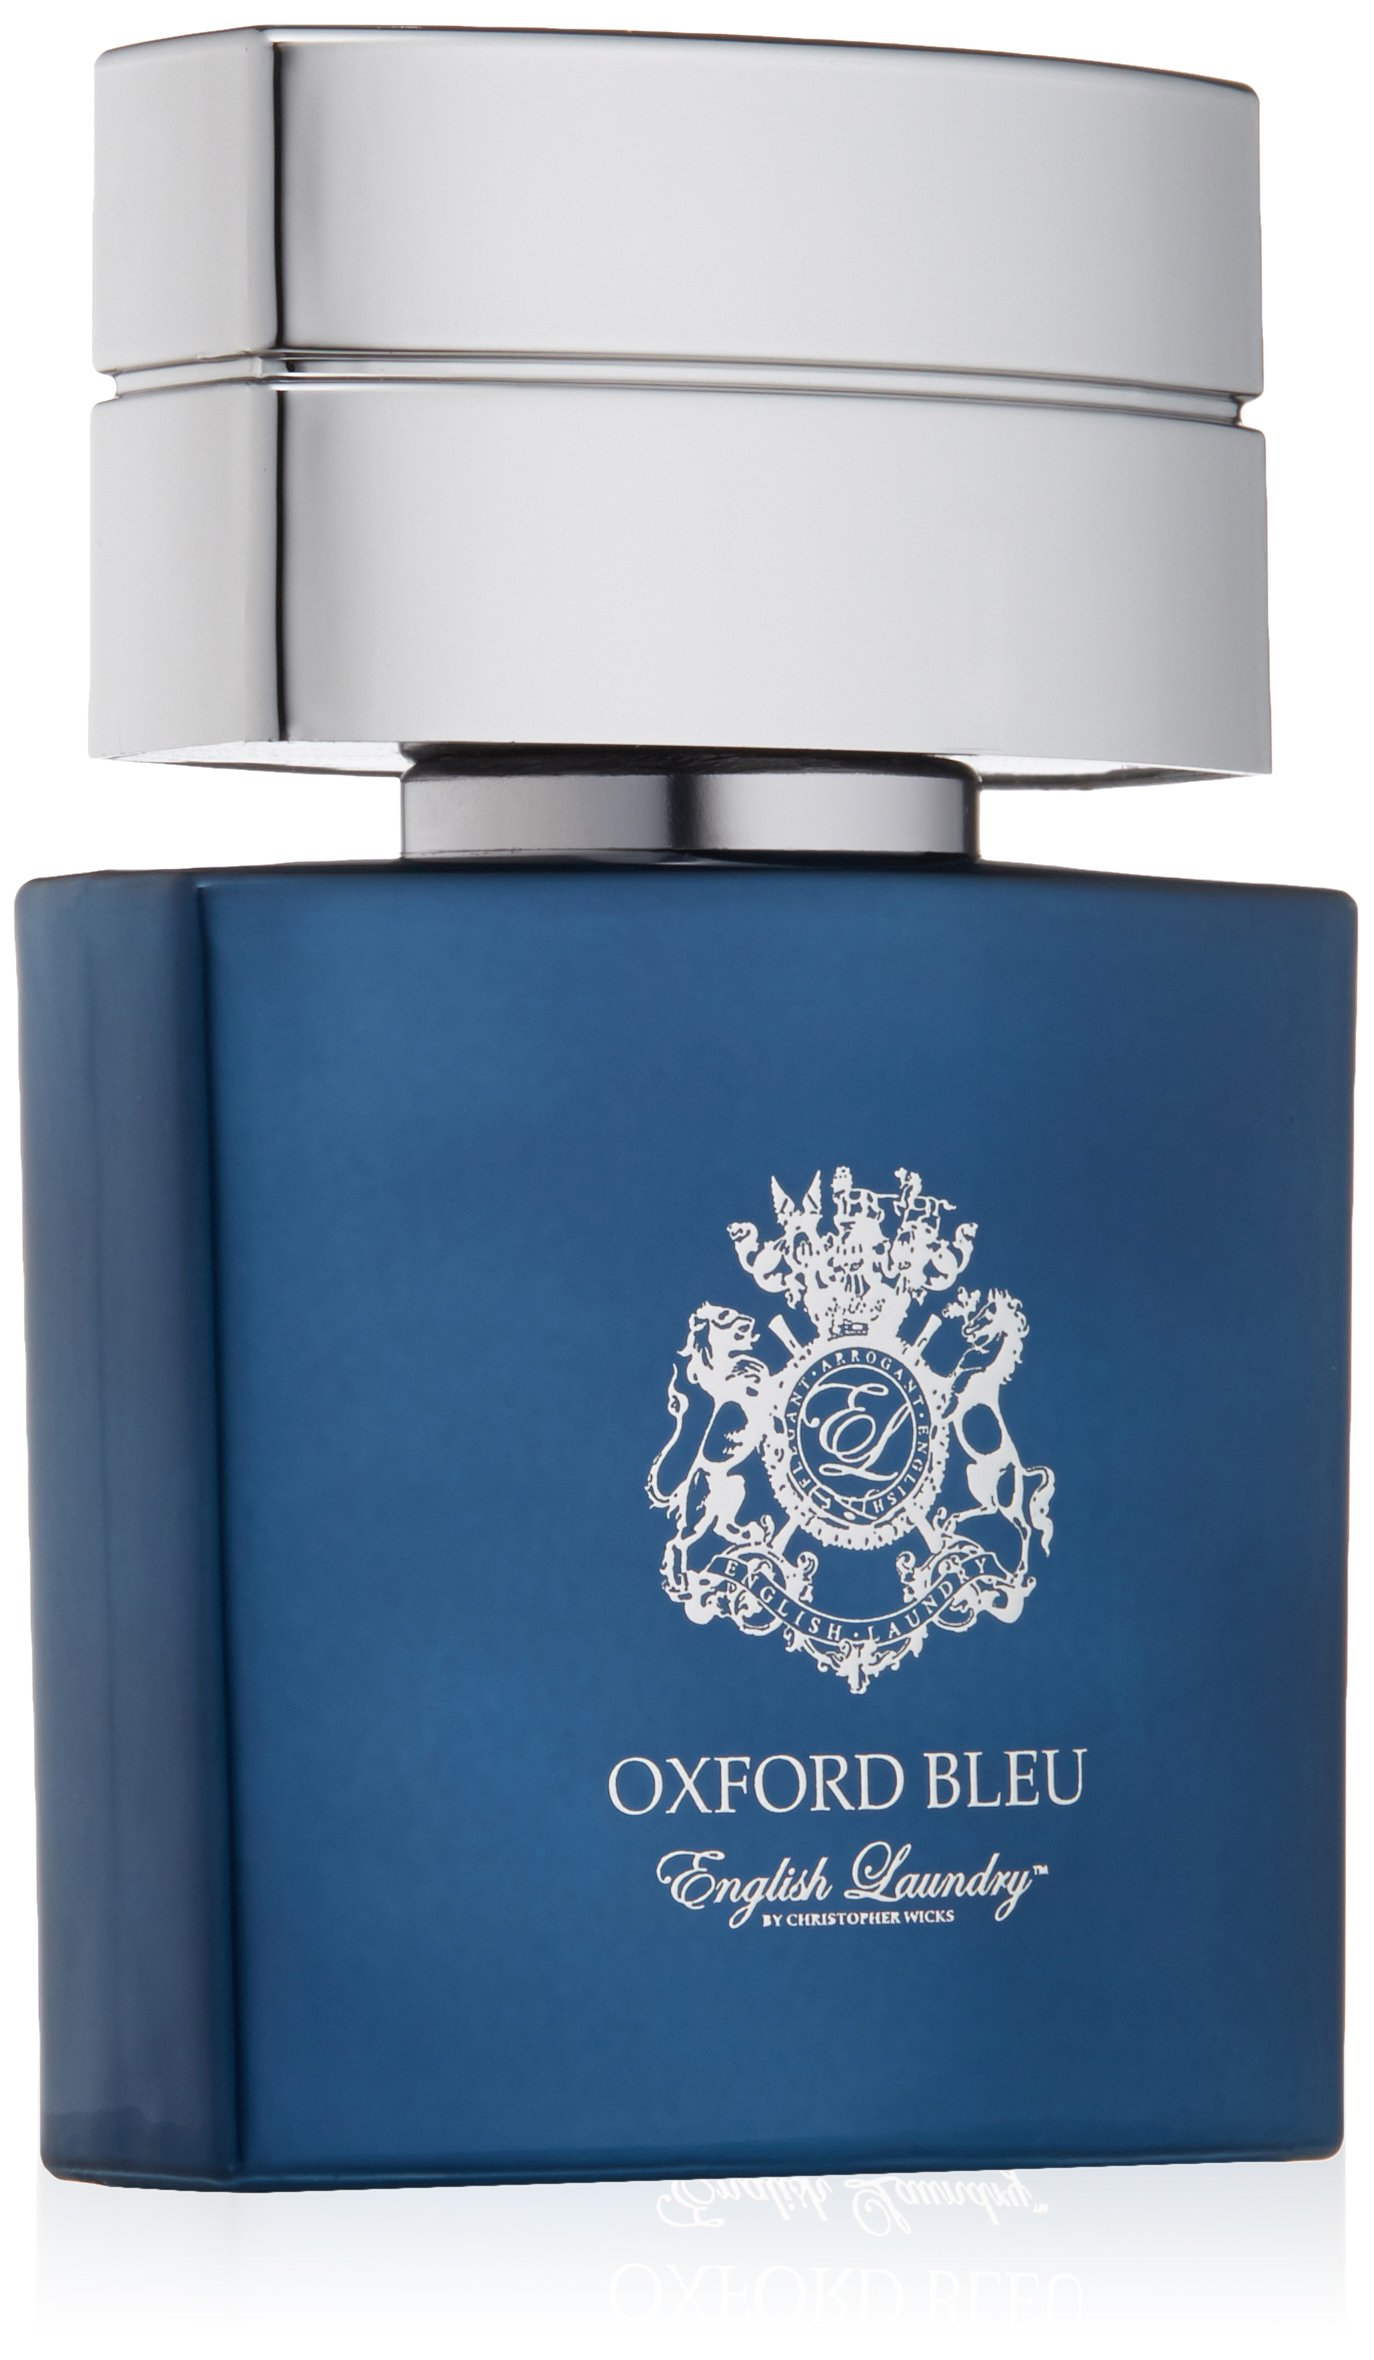 English Laundry Oxford Bleu Eau de Parfum, 0.68 oz. by English Laundry